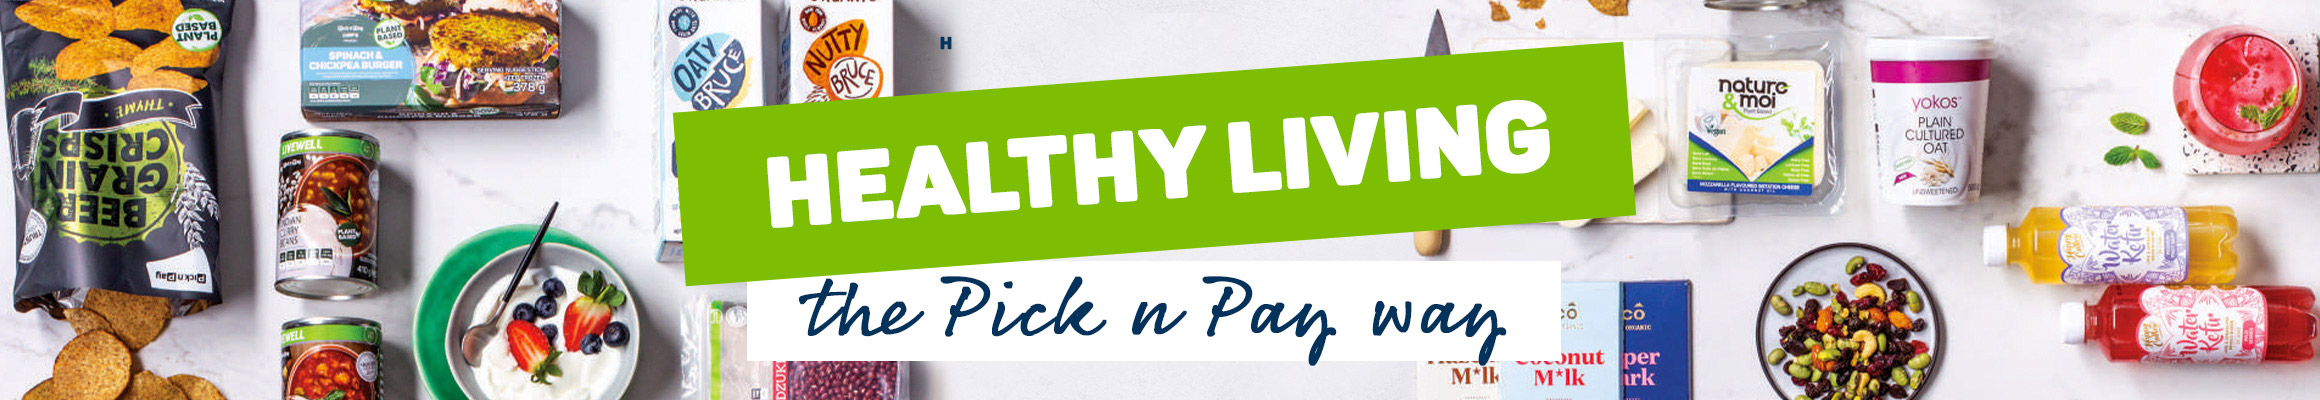 LiveWell - Health Range Shop